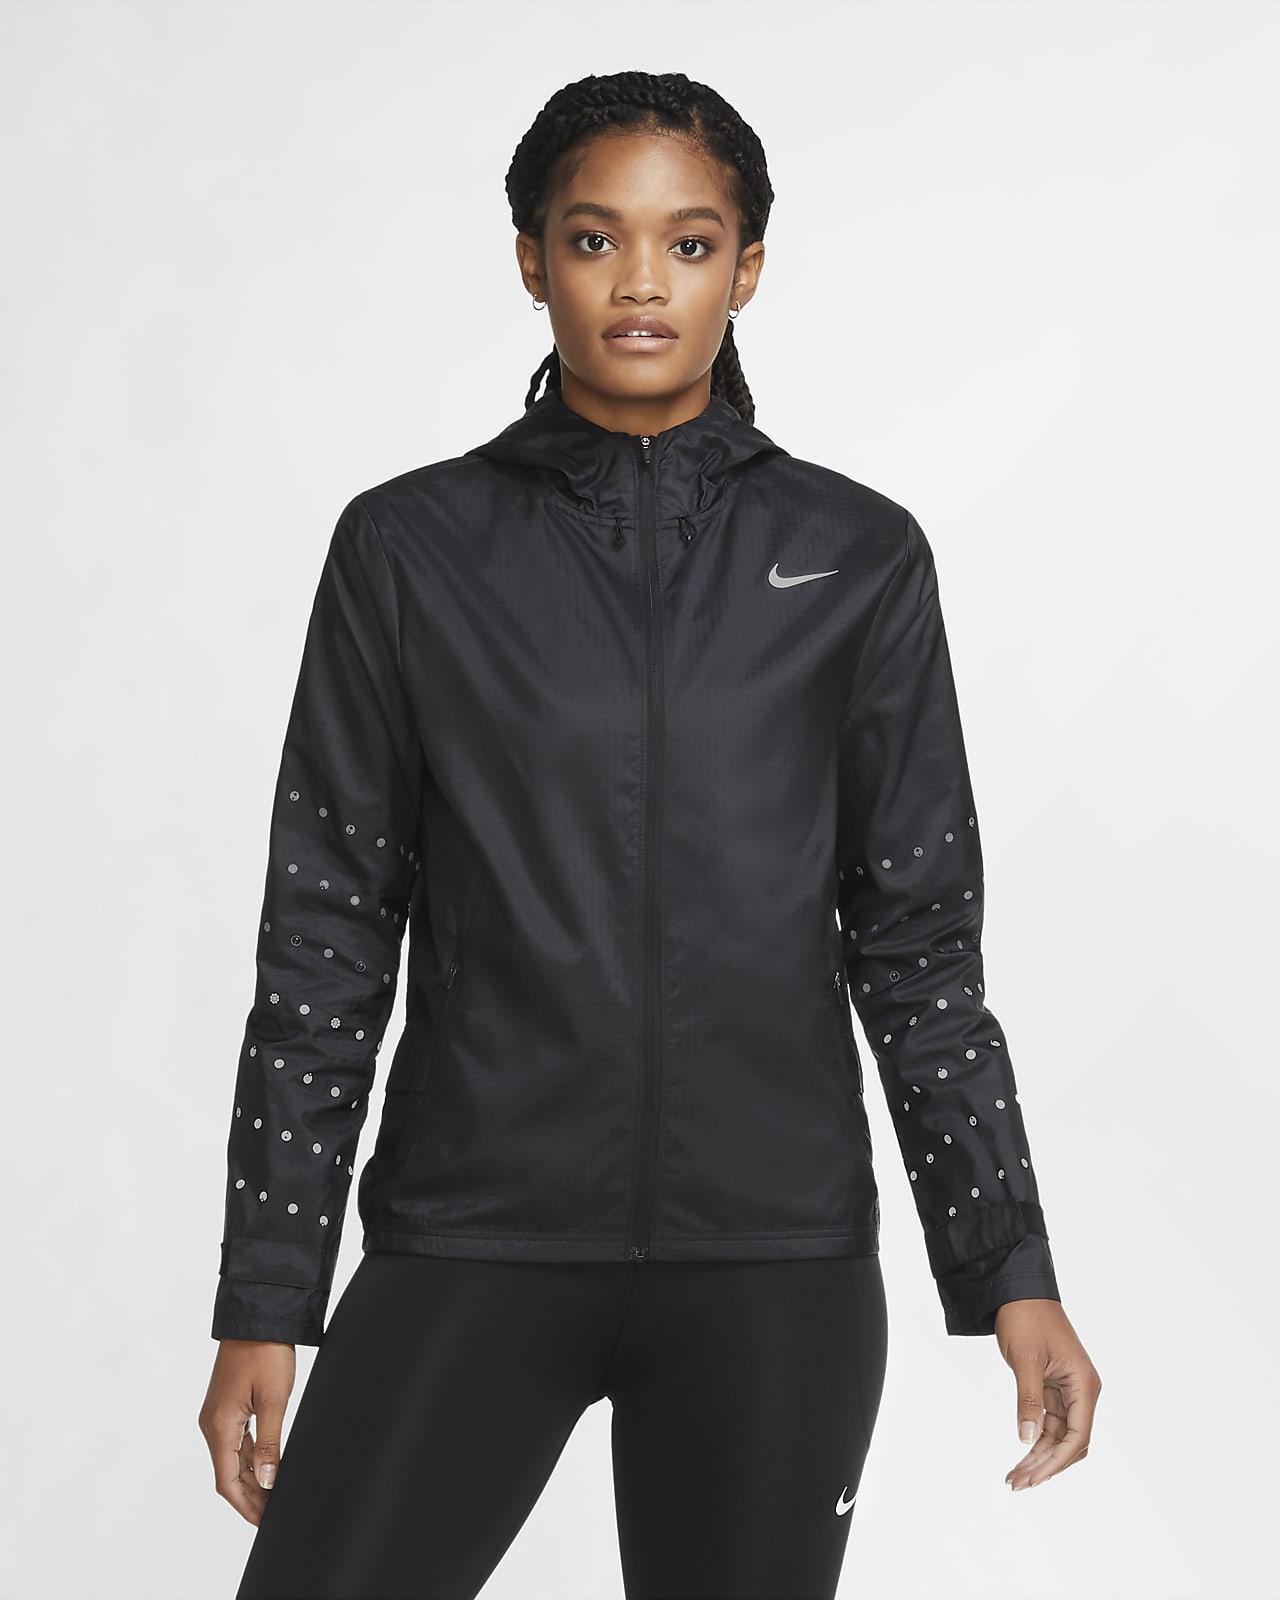 Nike Essential Flash Chaqueta de running con capucha - Mujer